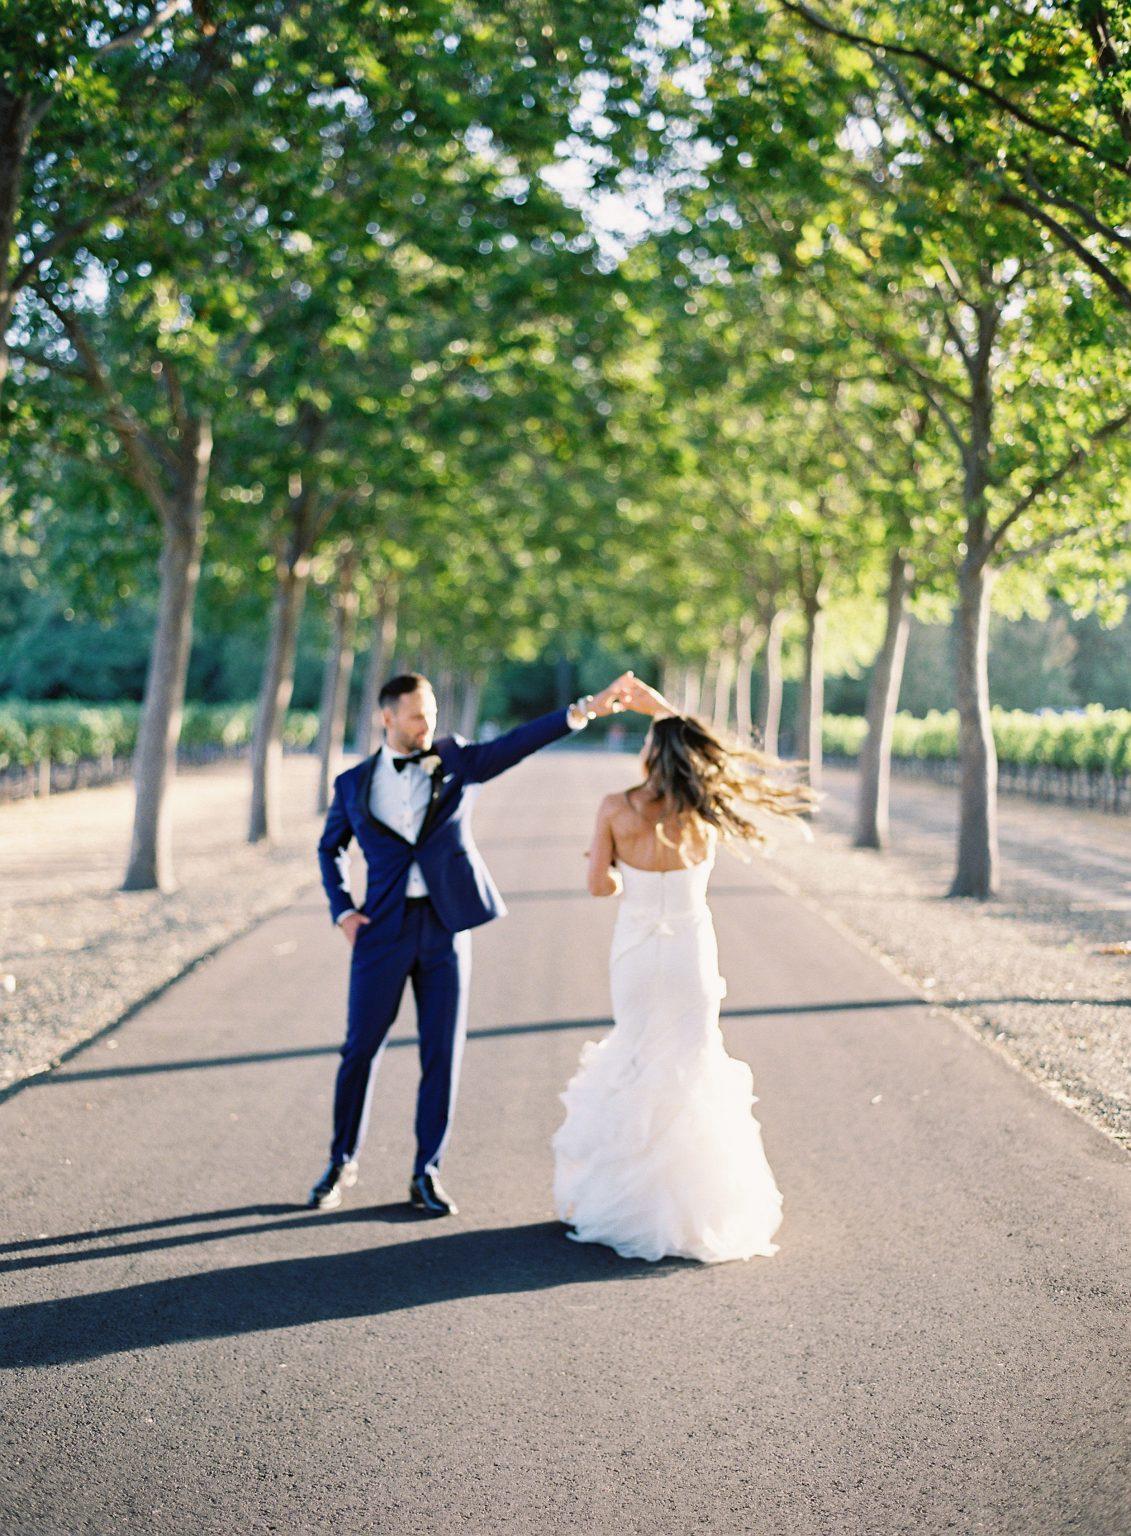 Danielle and Garrett - Dream Garden Wedding!